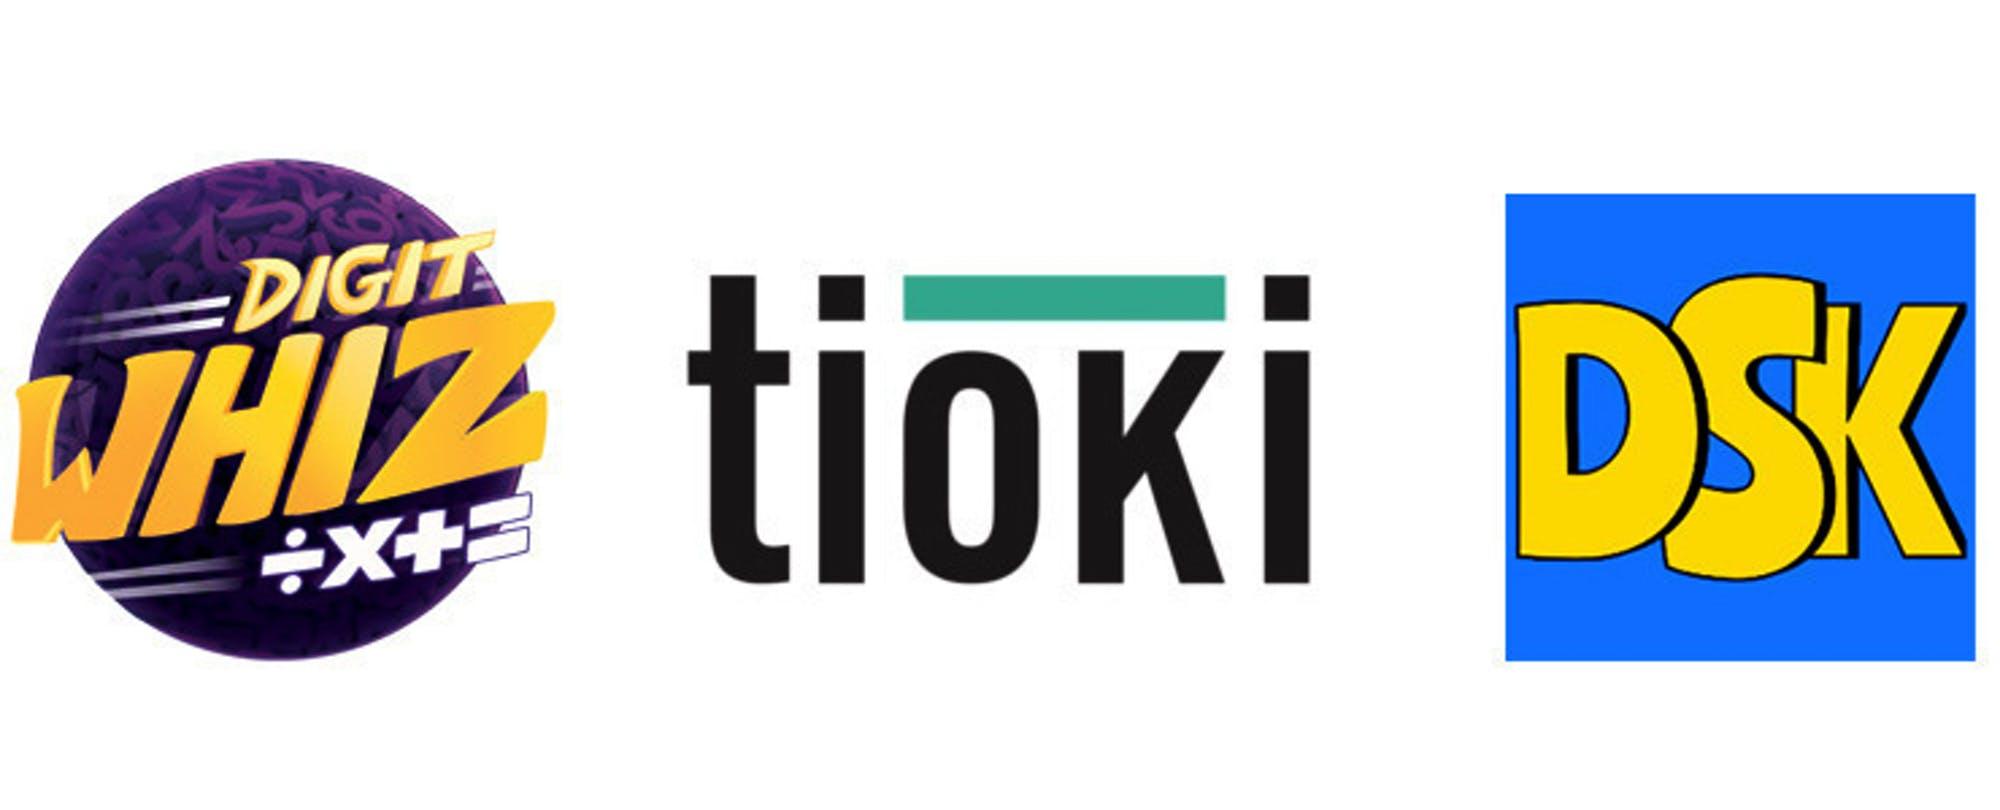 Imagine K12 Graduate Profiles: Digit Whiz, DSK, Tioki